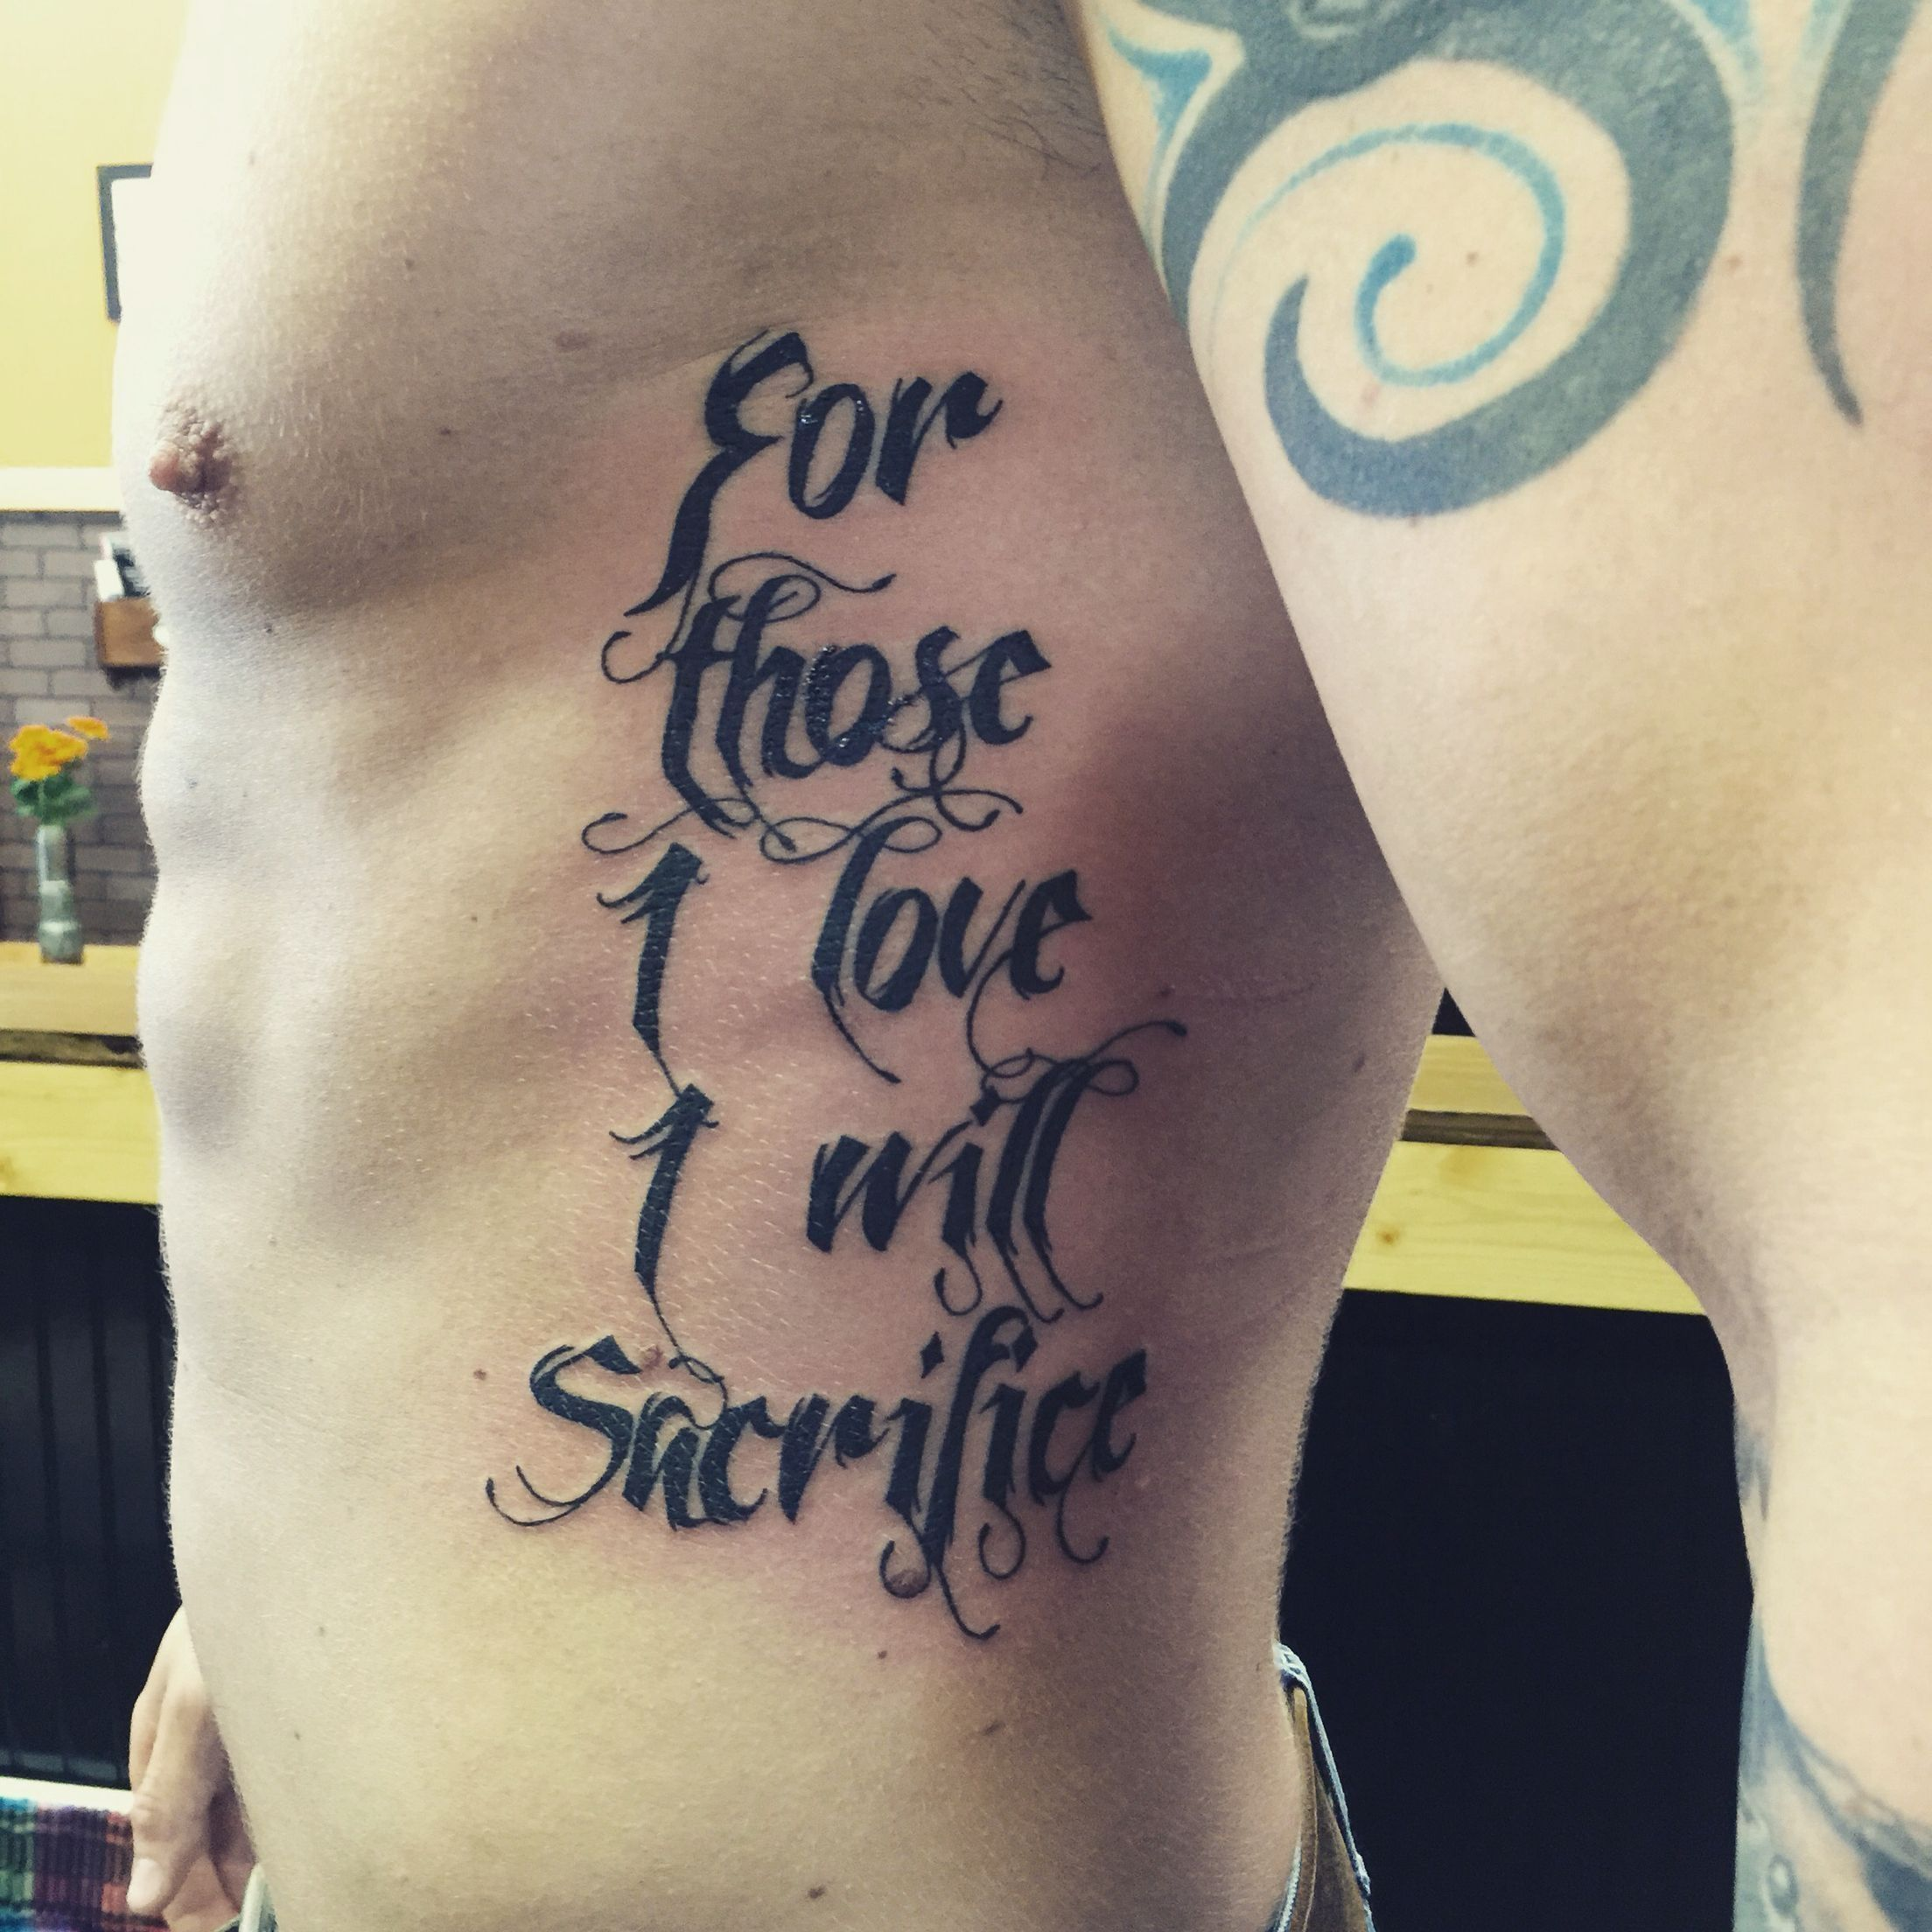 Amazing 35 Best Inspiring Tattoo Design for Cool Men http://klambeni.com/ 2019/04/03/35-best-inspiring-tatt… | Tattoos for guys, Tattoo quotes for  men, Tattoo quotes